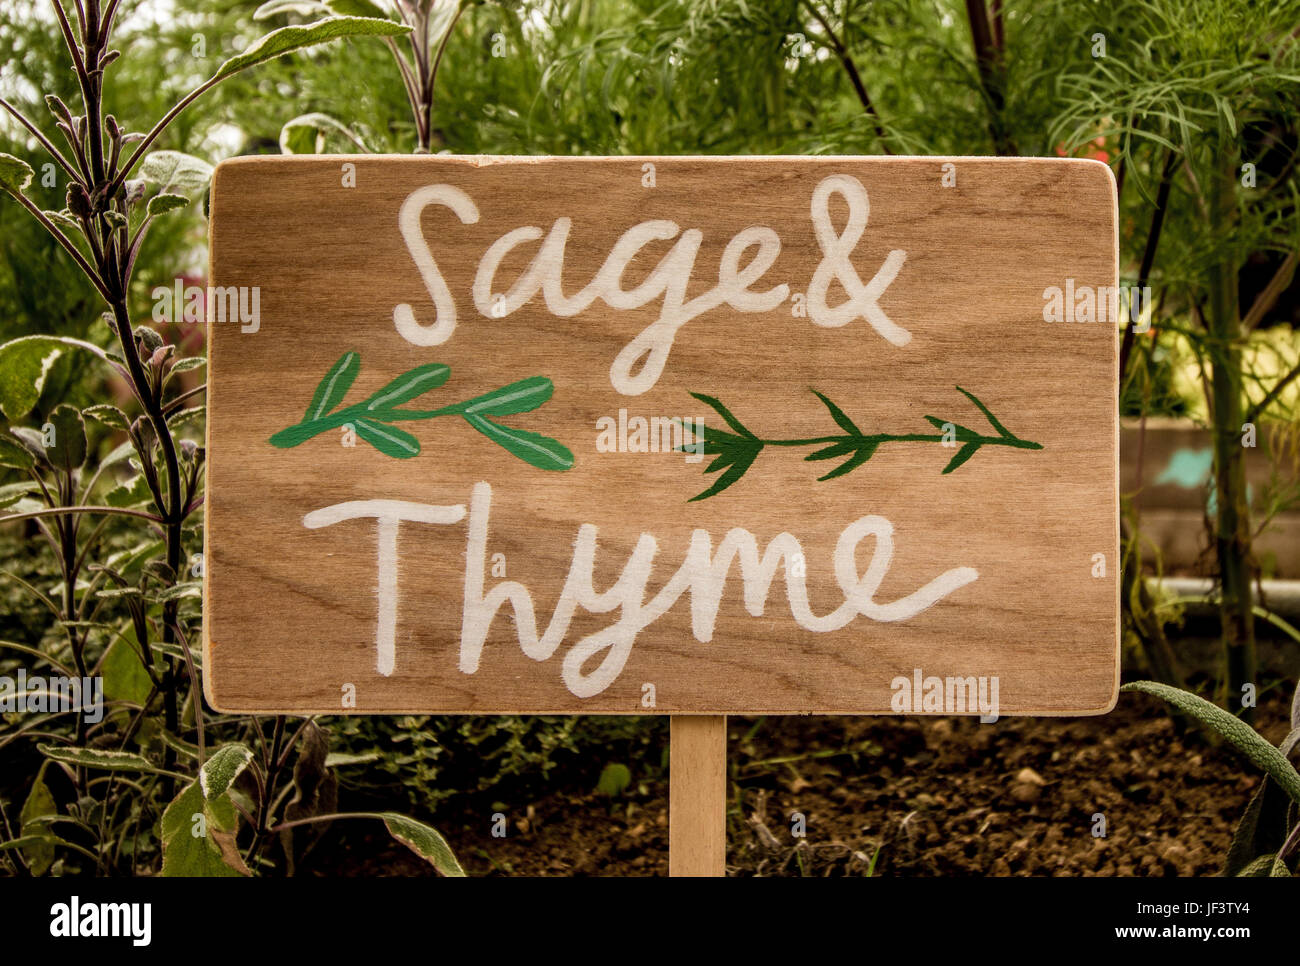 Herd garden sign taken in the garden 2016 Stock Photo: 146988216 - Alamy